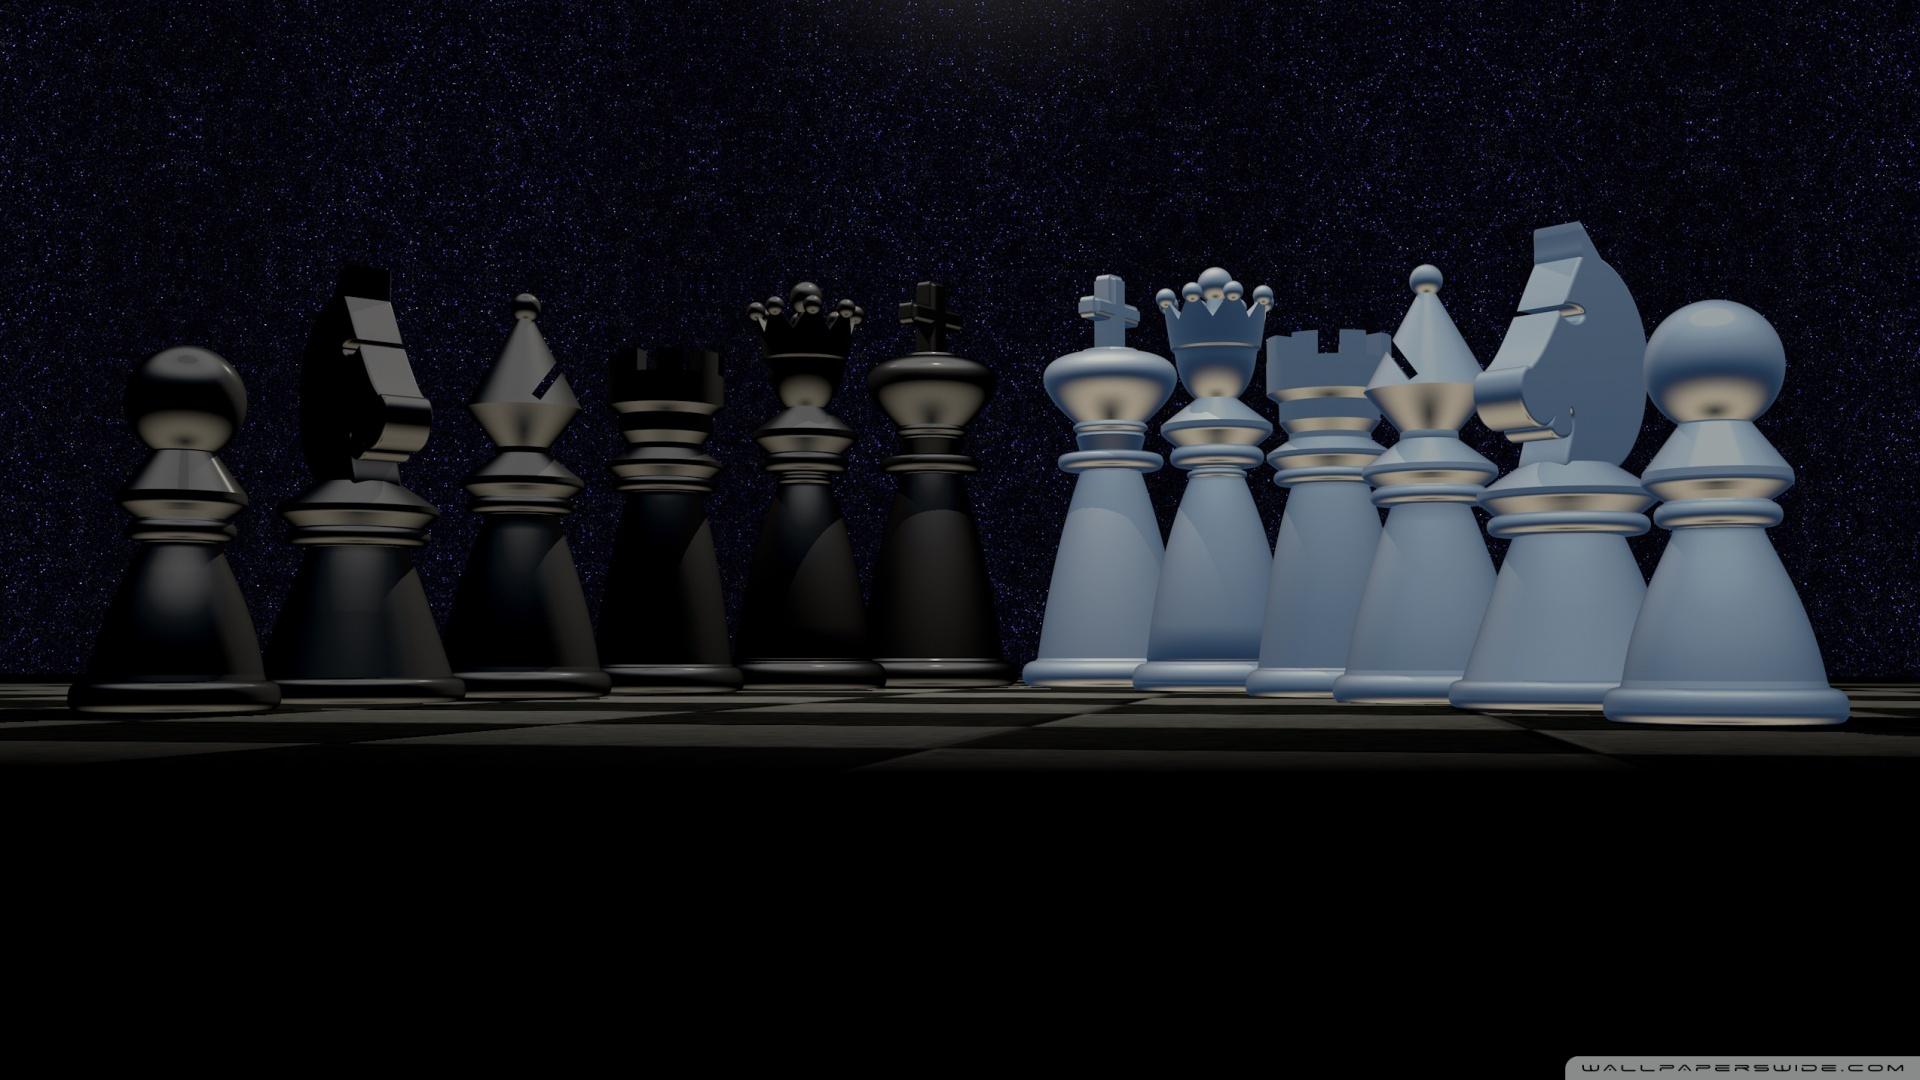 Chess Pieces 4K HD Desktop Wallpaper For 4K Ultra HD TV